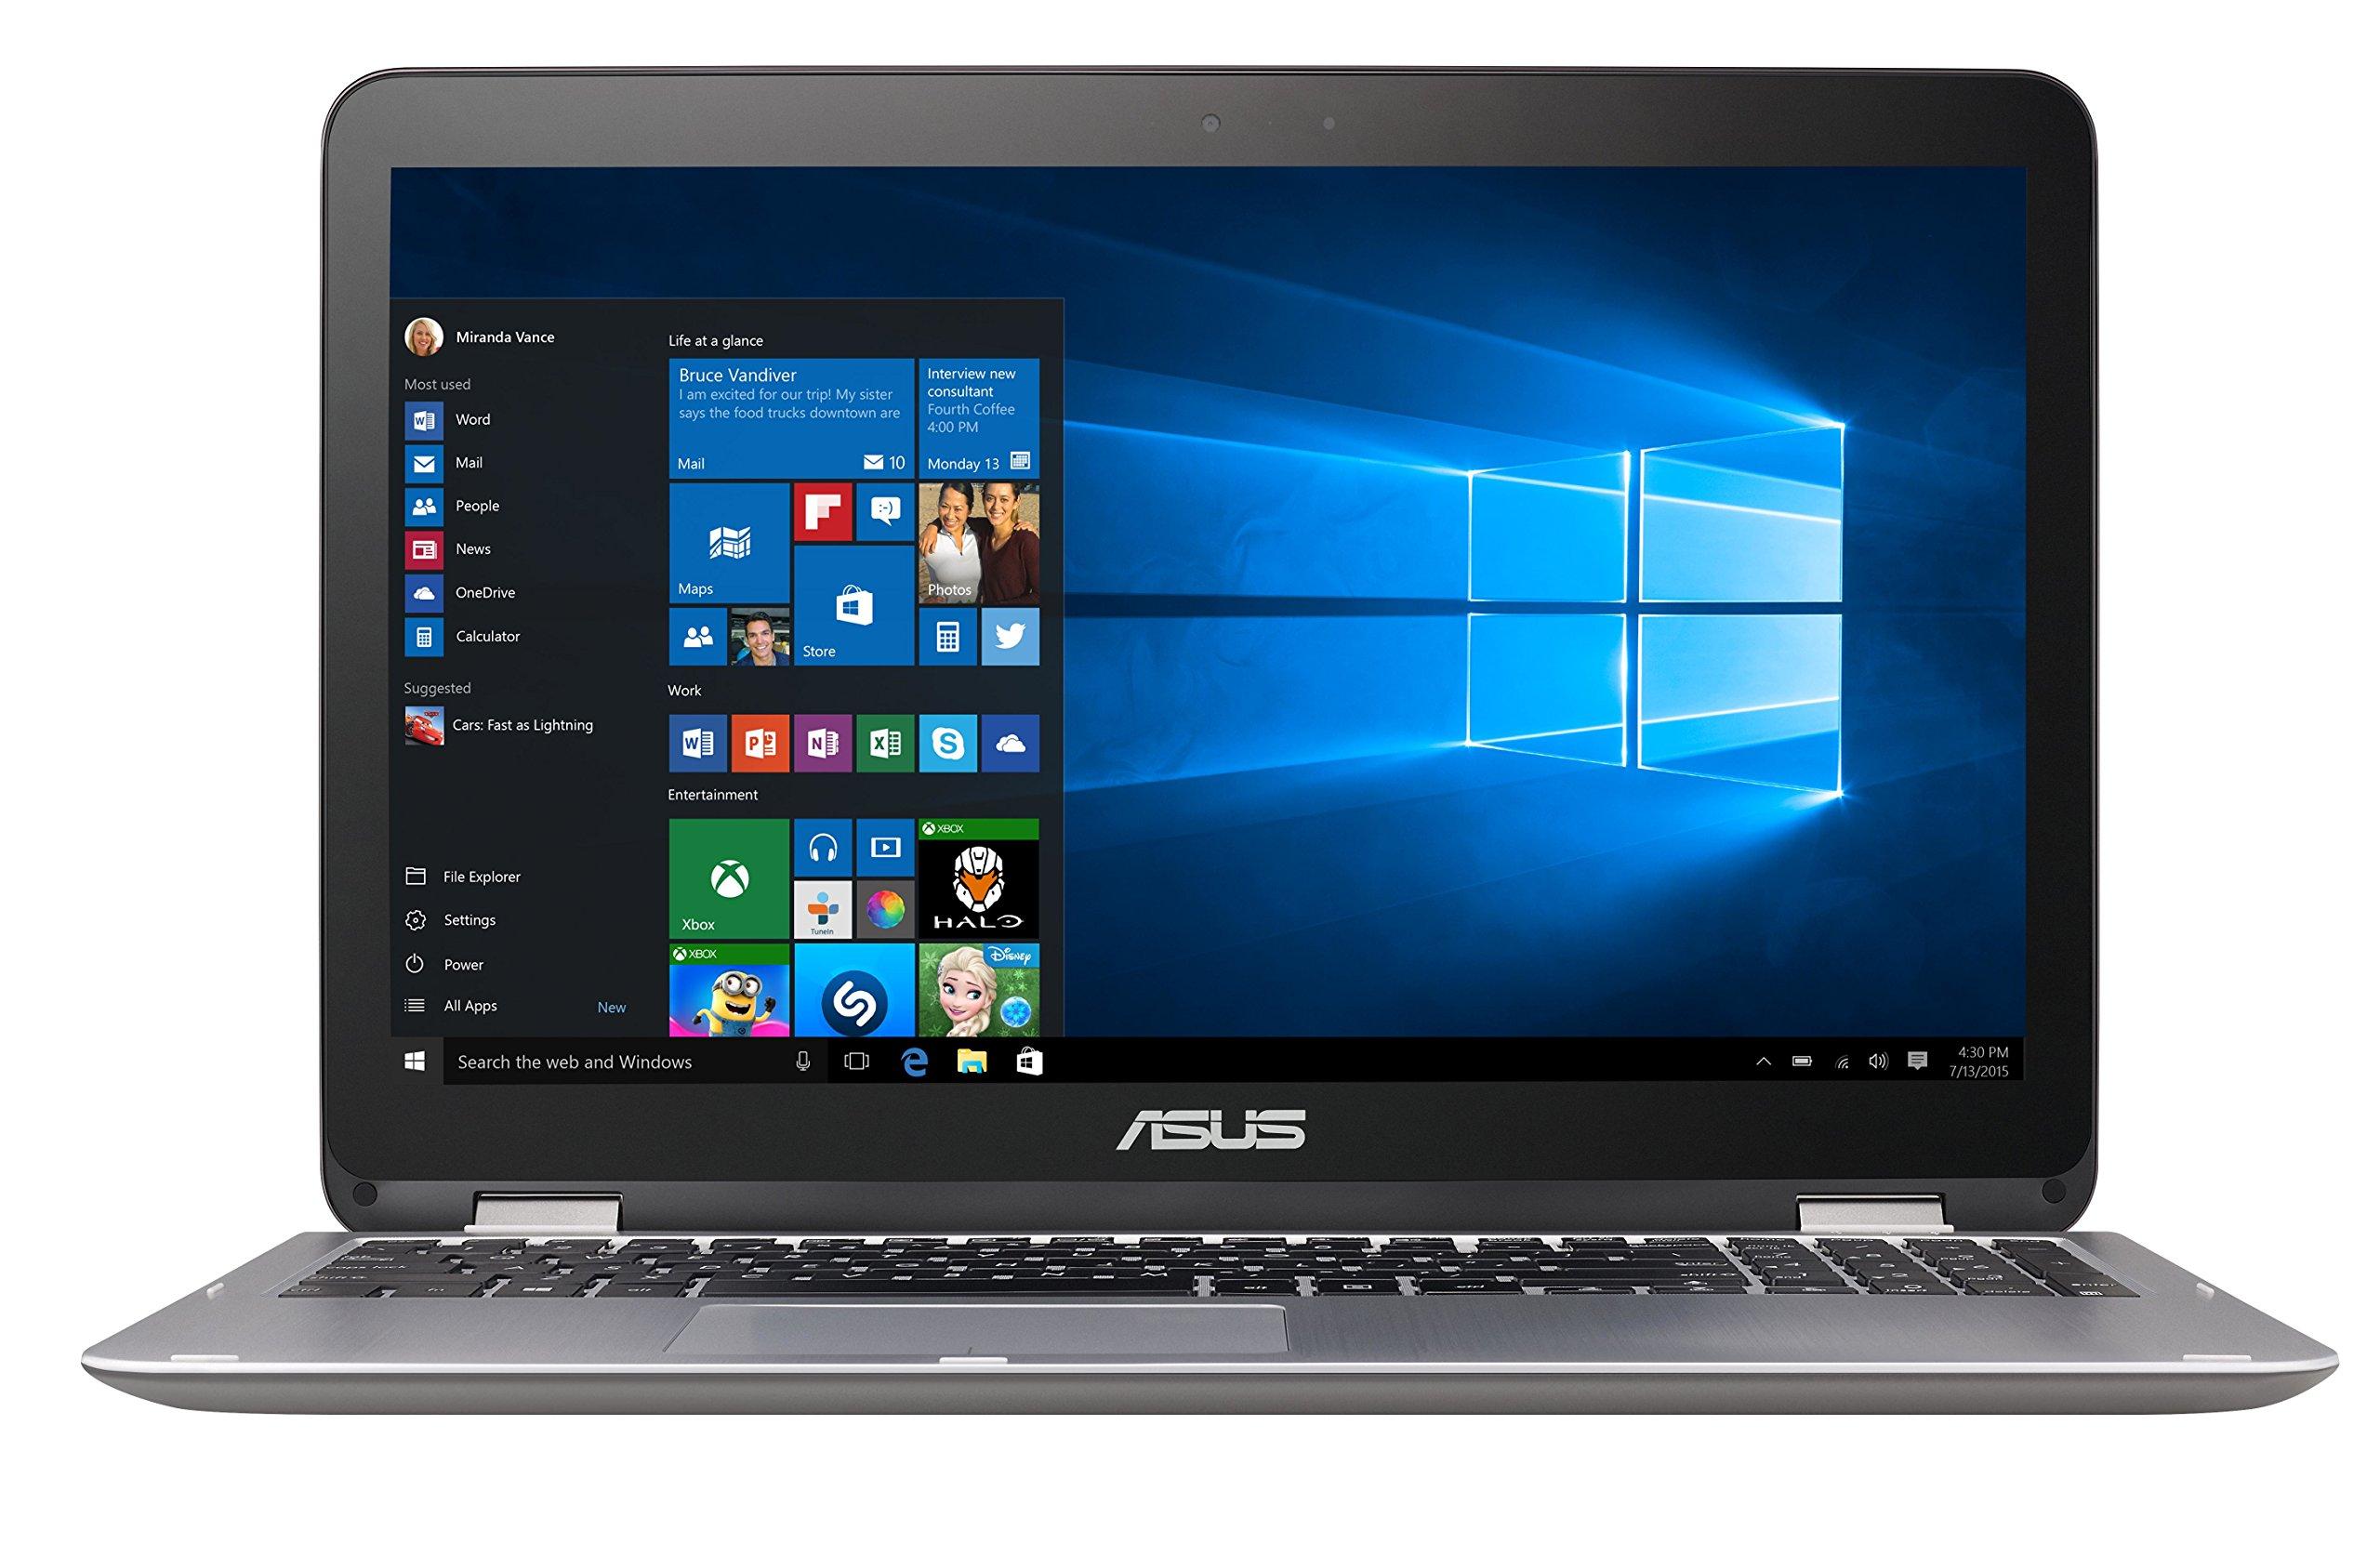 "Asus VivoBook Flip Convertible 15.6"" Touchscreen Laptop, Intel Core i3-6100U 2.3GHz, 4GB DDR4, 128GB SSD, Bluetooth, Windows 10 Home"